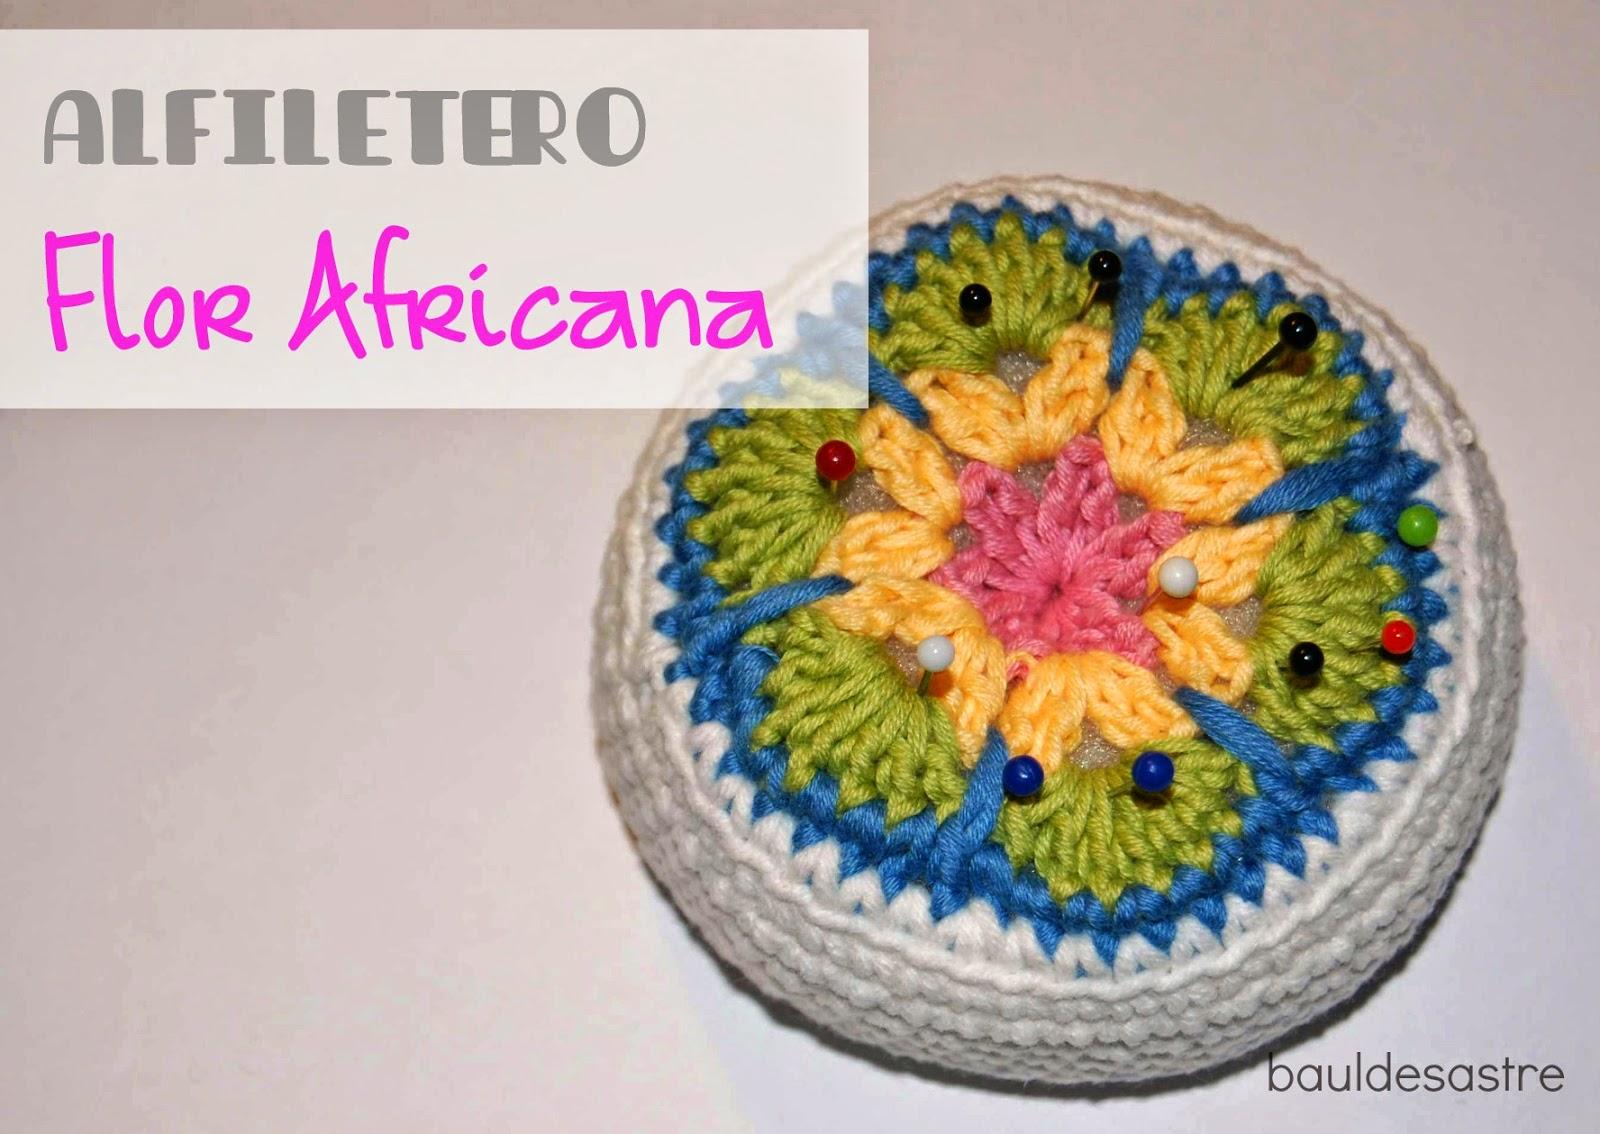 Teje en PEQUES: Tutorial. Alfiletero Flor Africana a Crochet